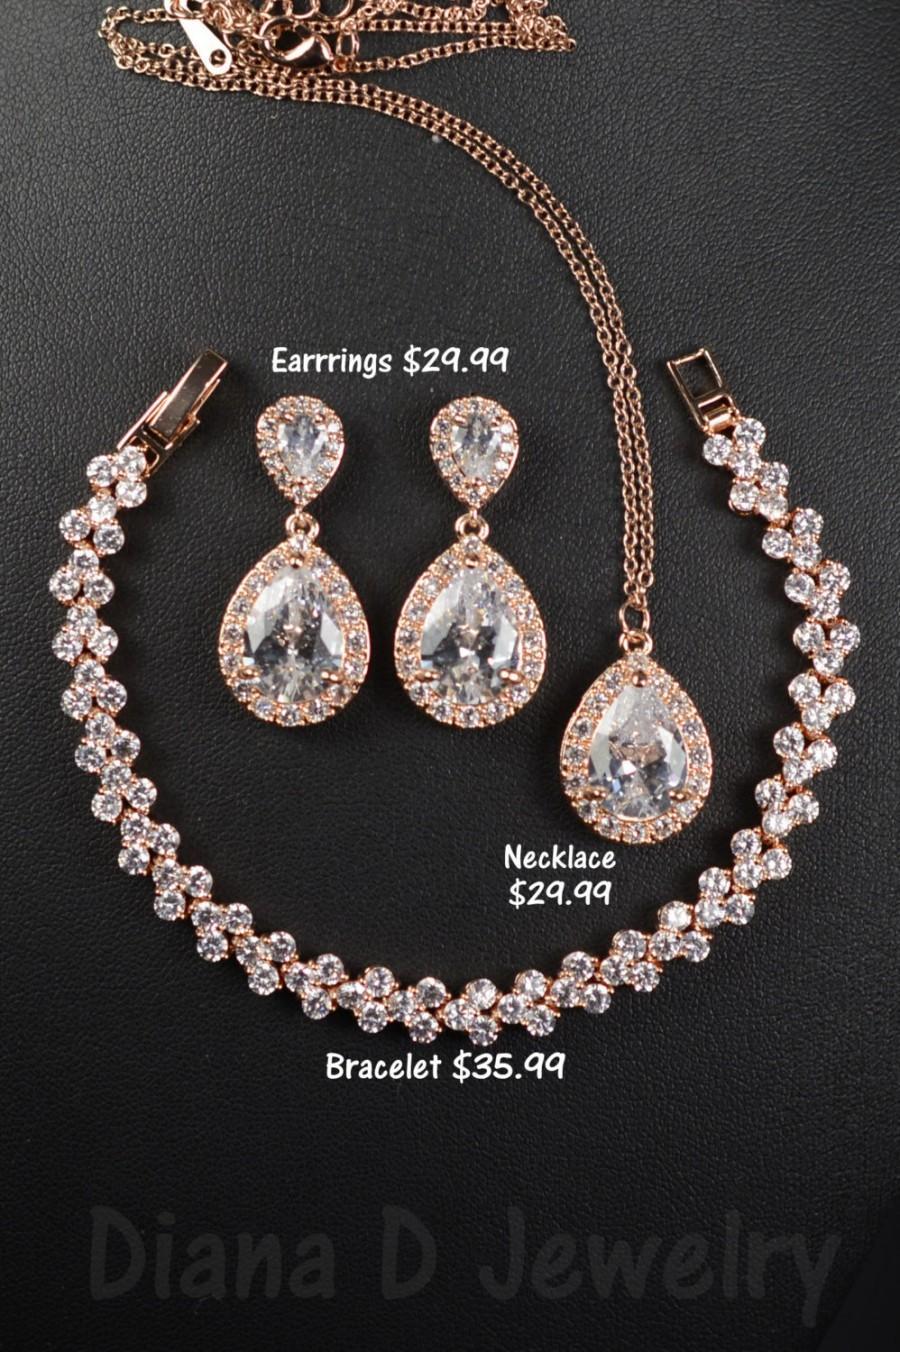 Wedding - Bridesmaid Gift, Bridesmaid Jewelry Set, Bridesmaid Earrings, Necklace and Bracelet Set, Personalized Bridesmaid Gift, Wedding Jewelry Set